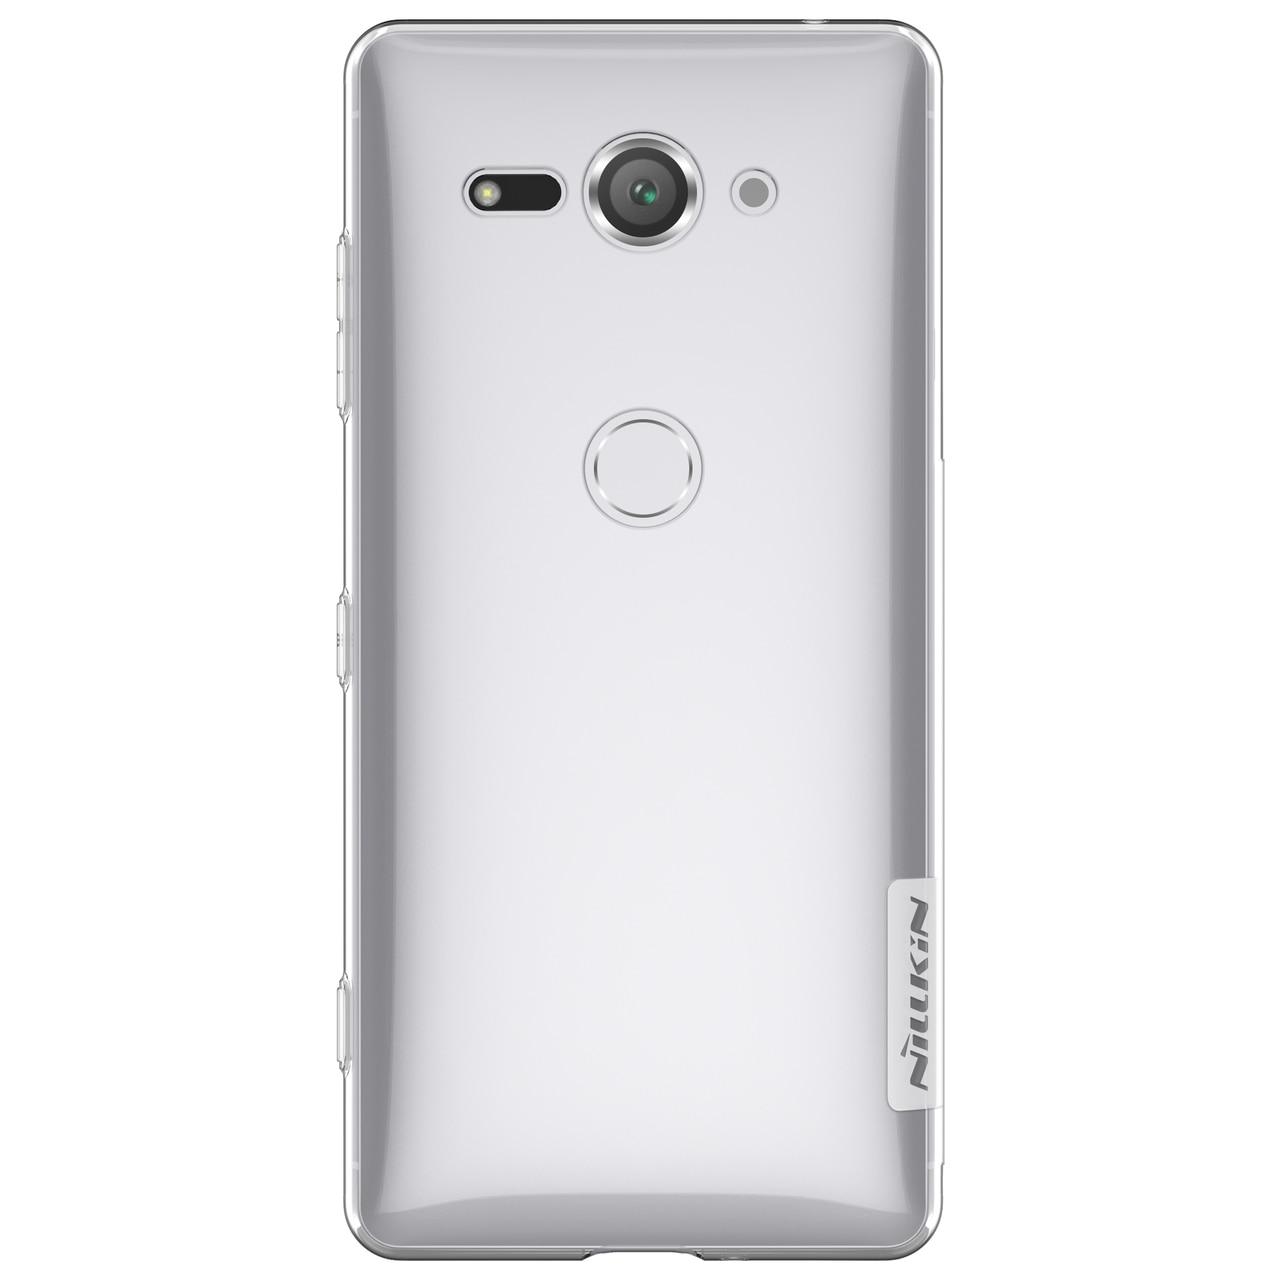 Sony Xperia XZ2 Compact Premium Silicon Cover by Nillkin - Transparent